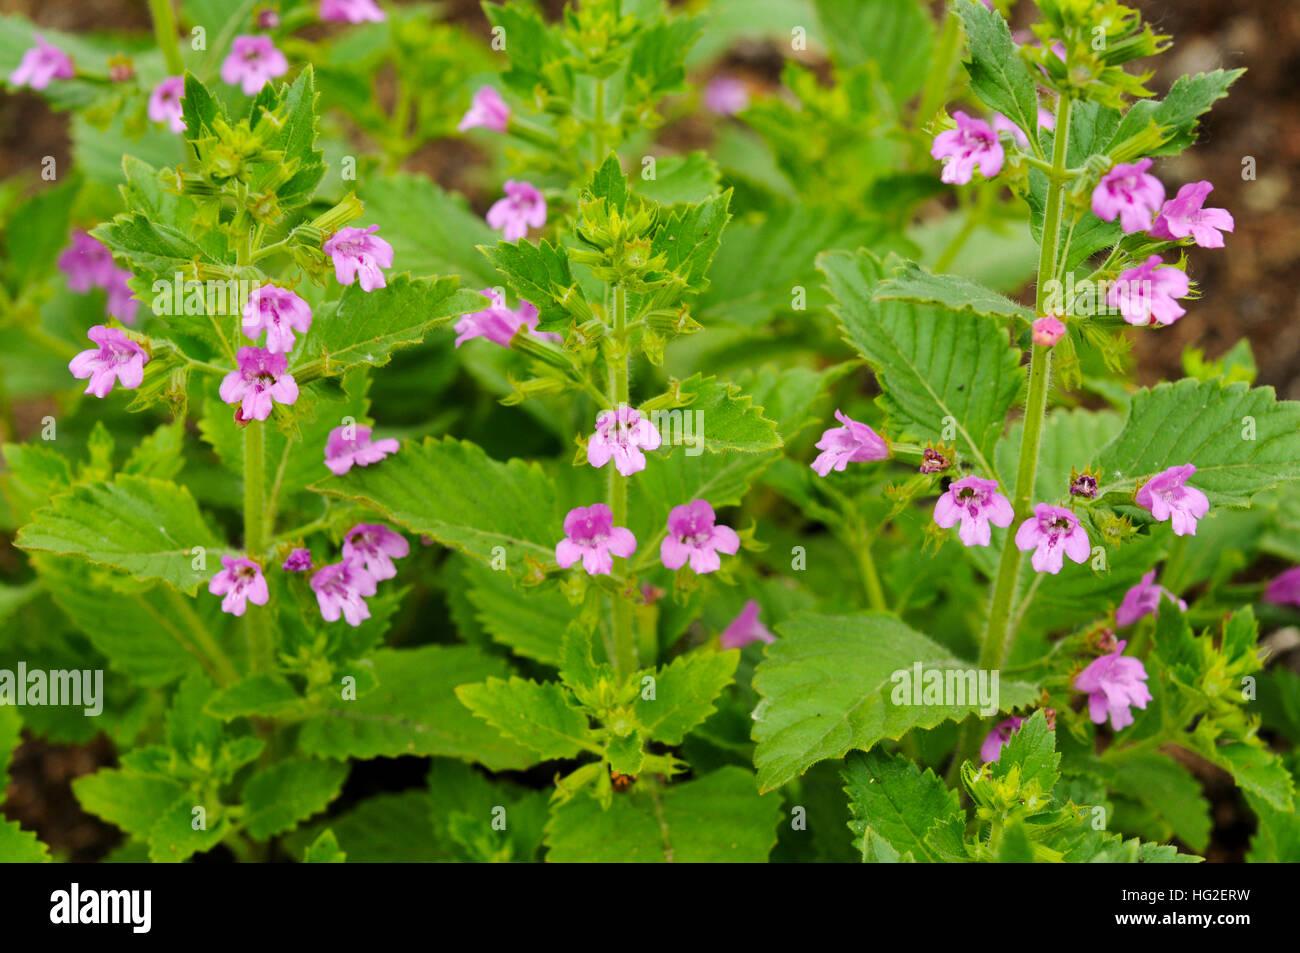 The Pink Flowers Of Calamintha Grandiflora Stock Photo Alamy